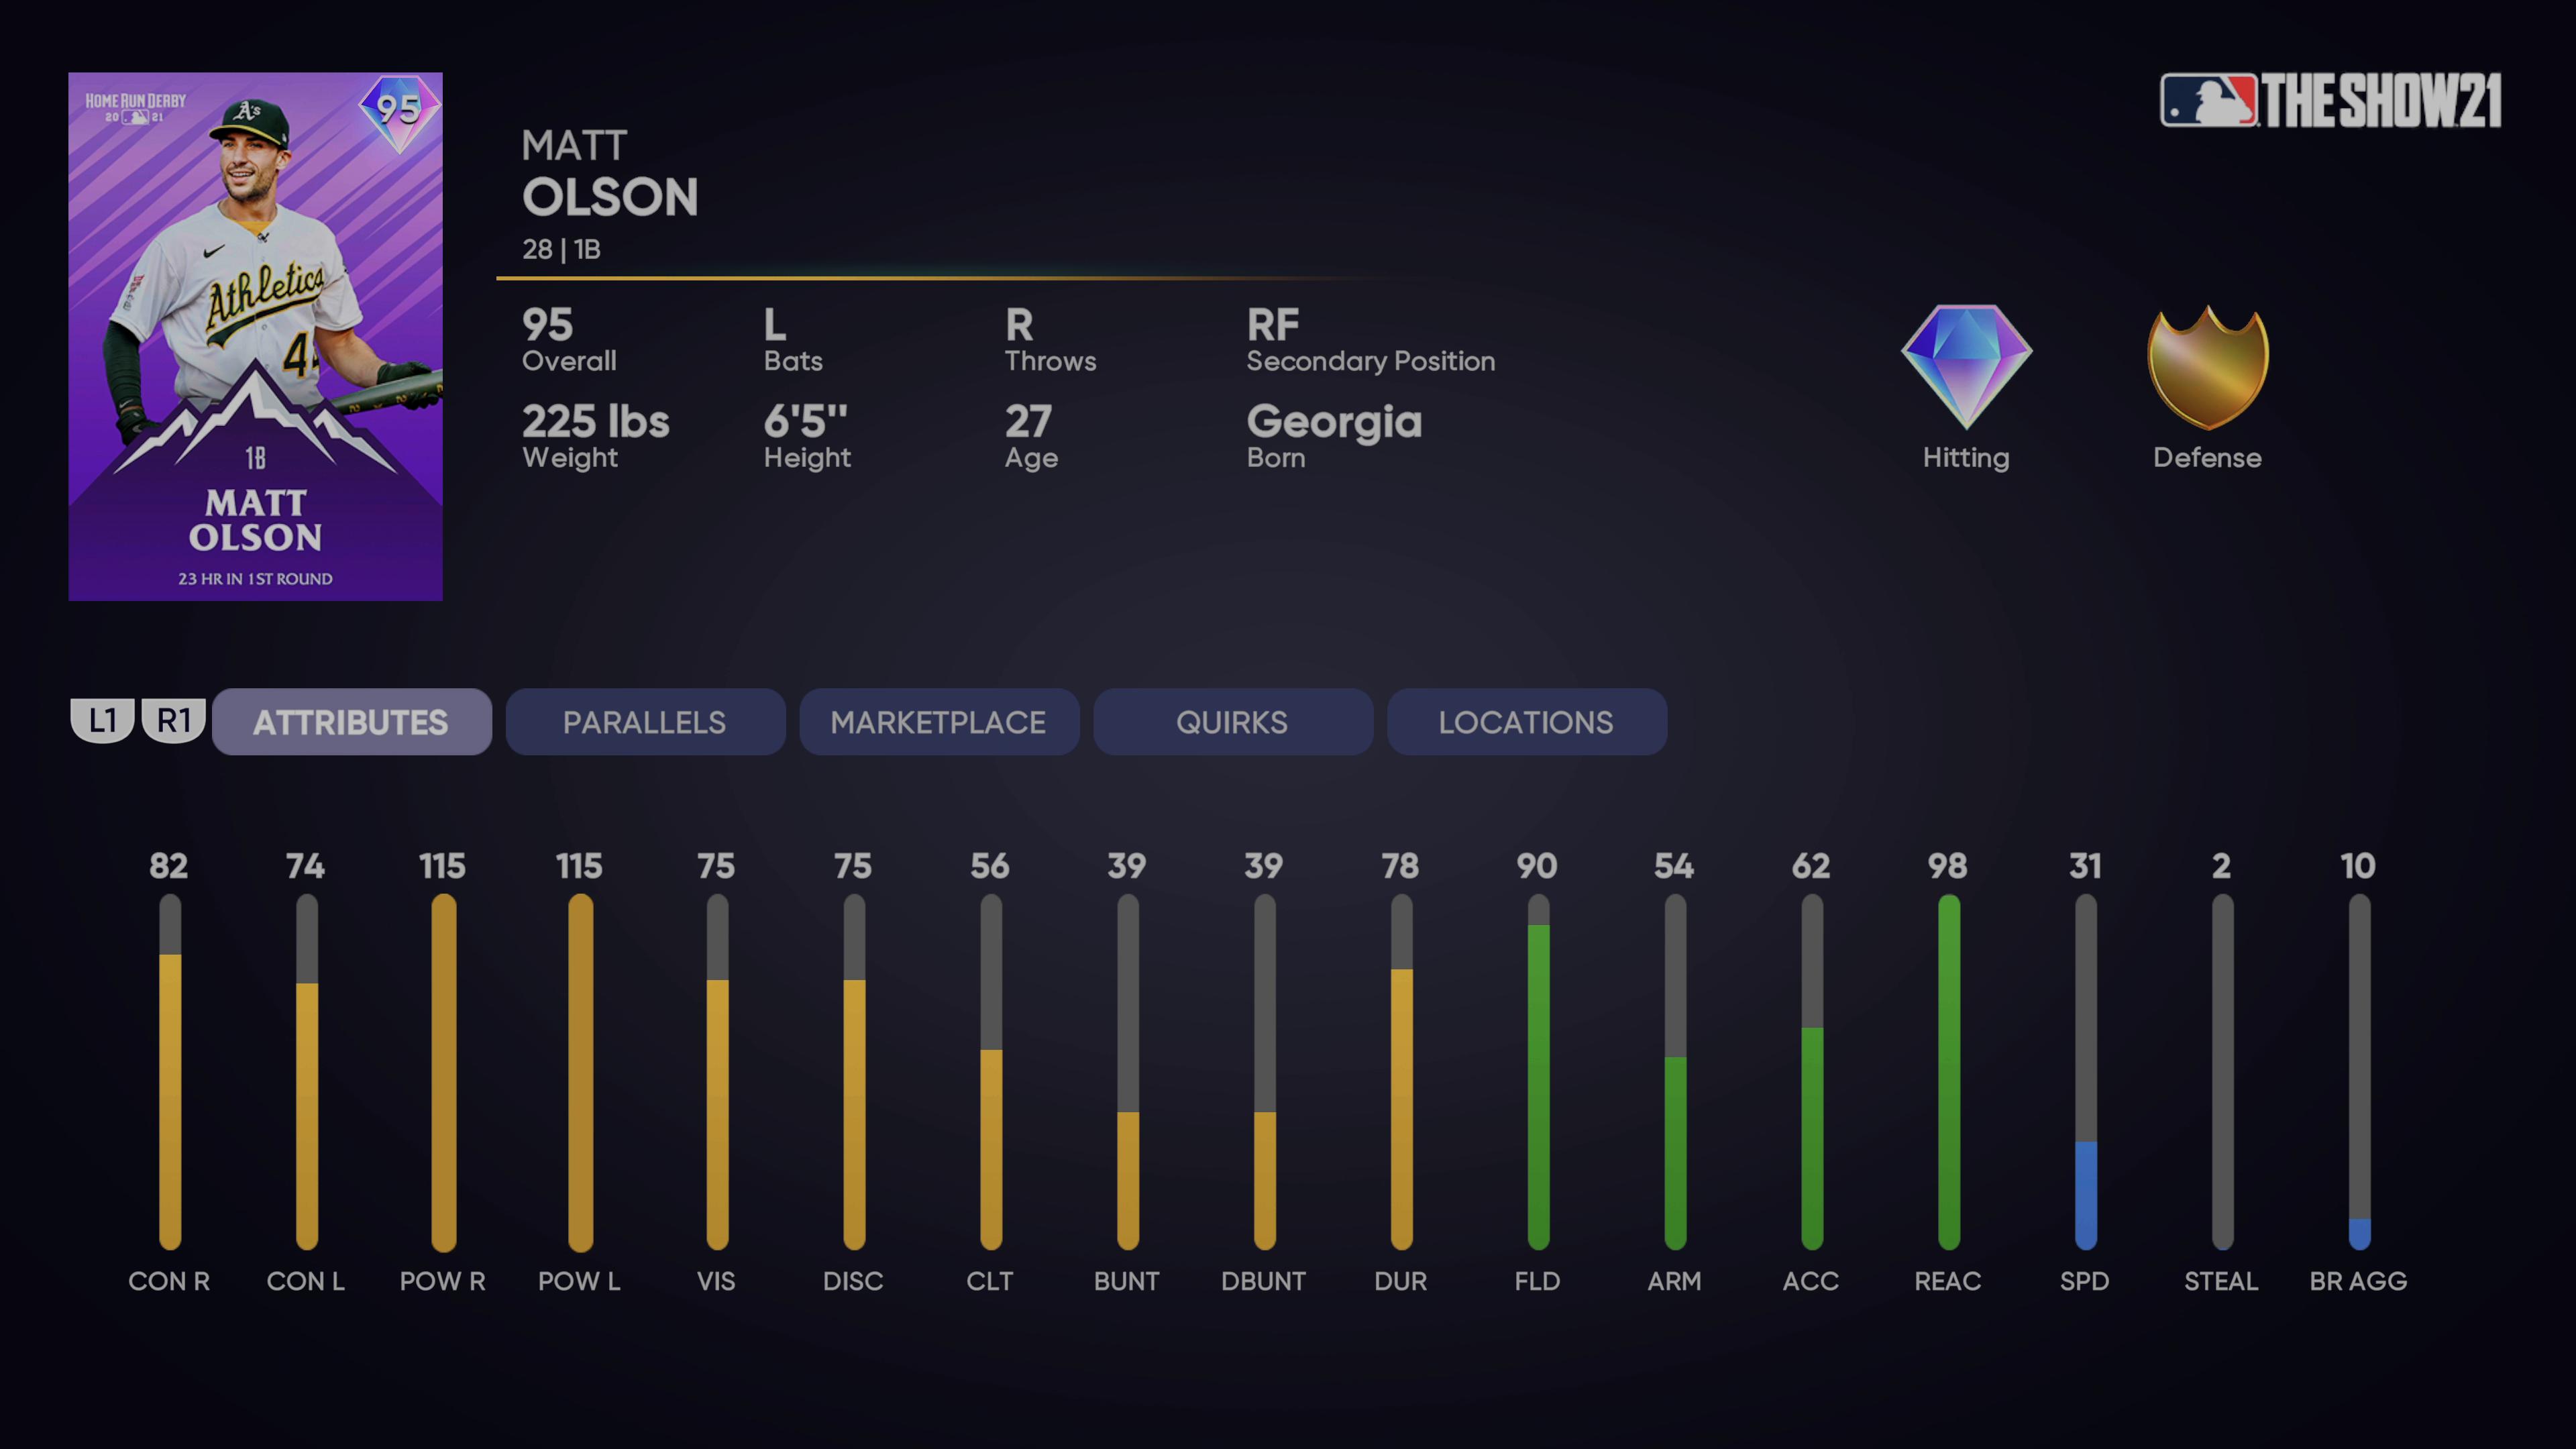 MLB The Show 21 - Home Run Derby_2021-07-13_02-06-35